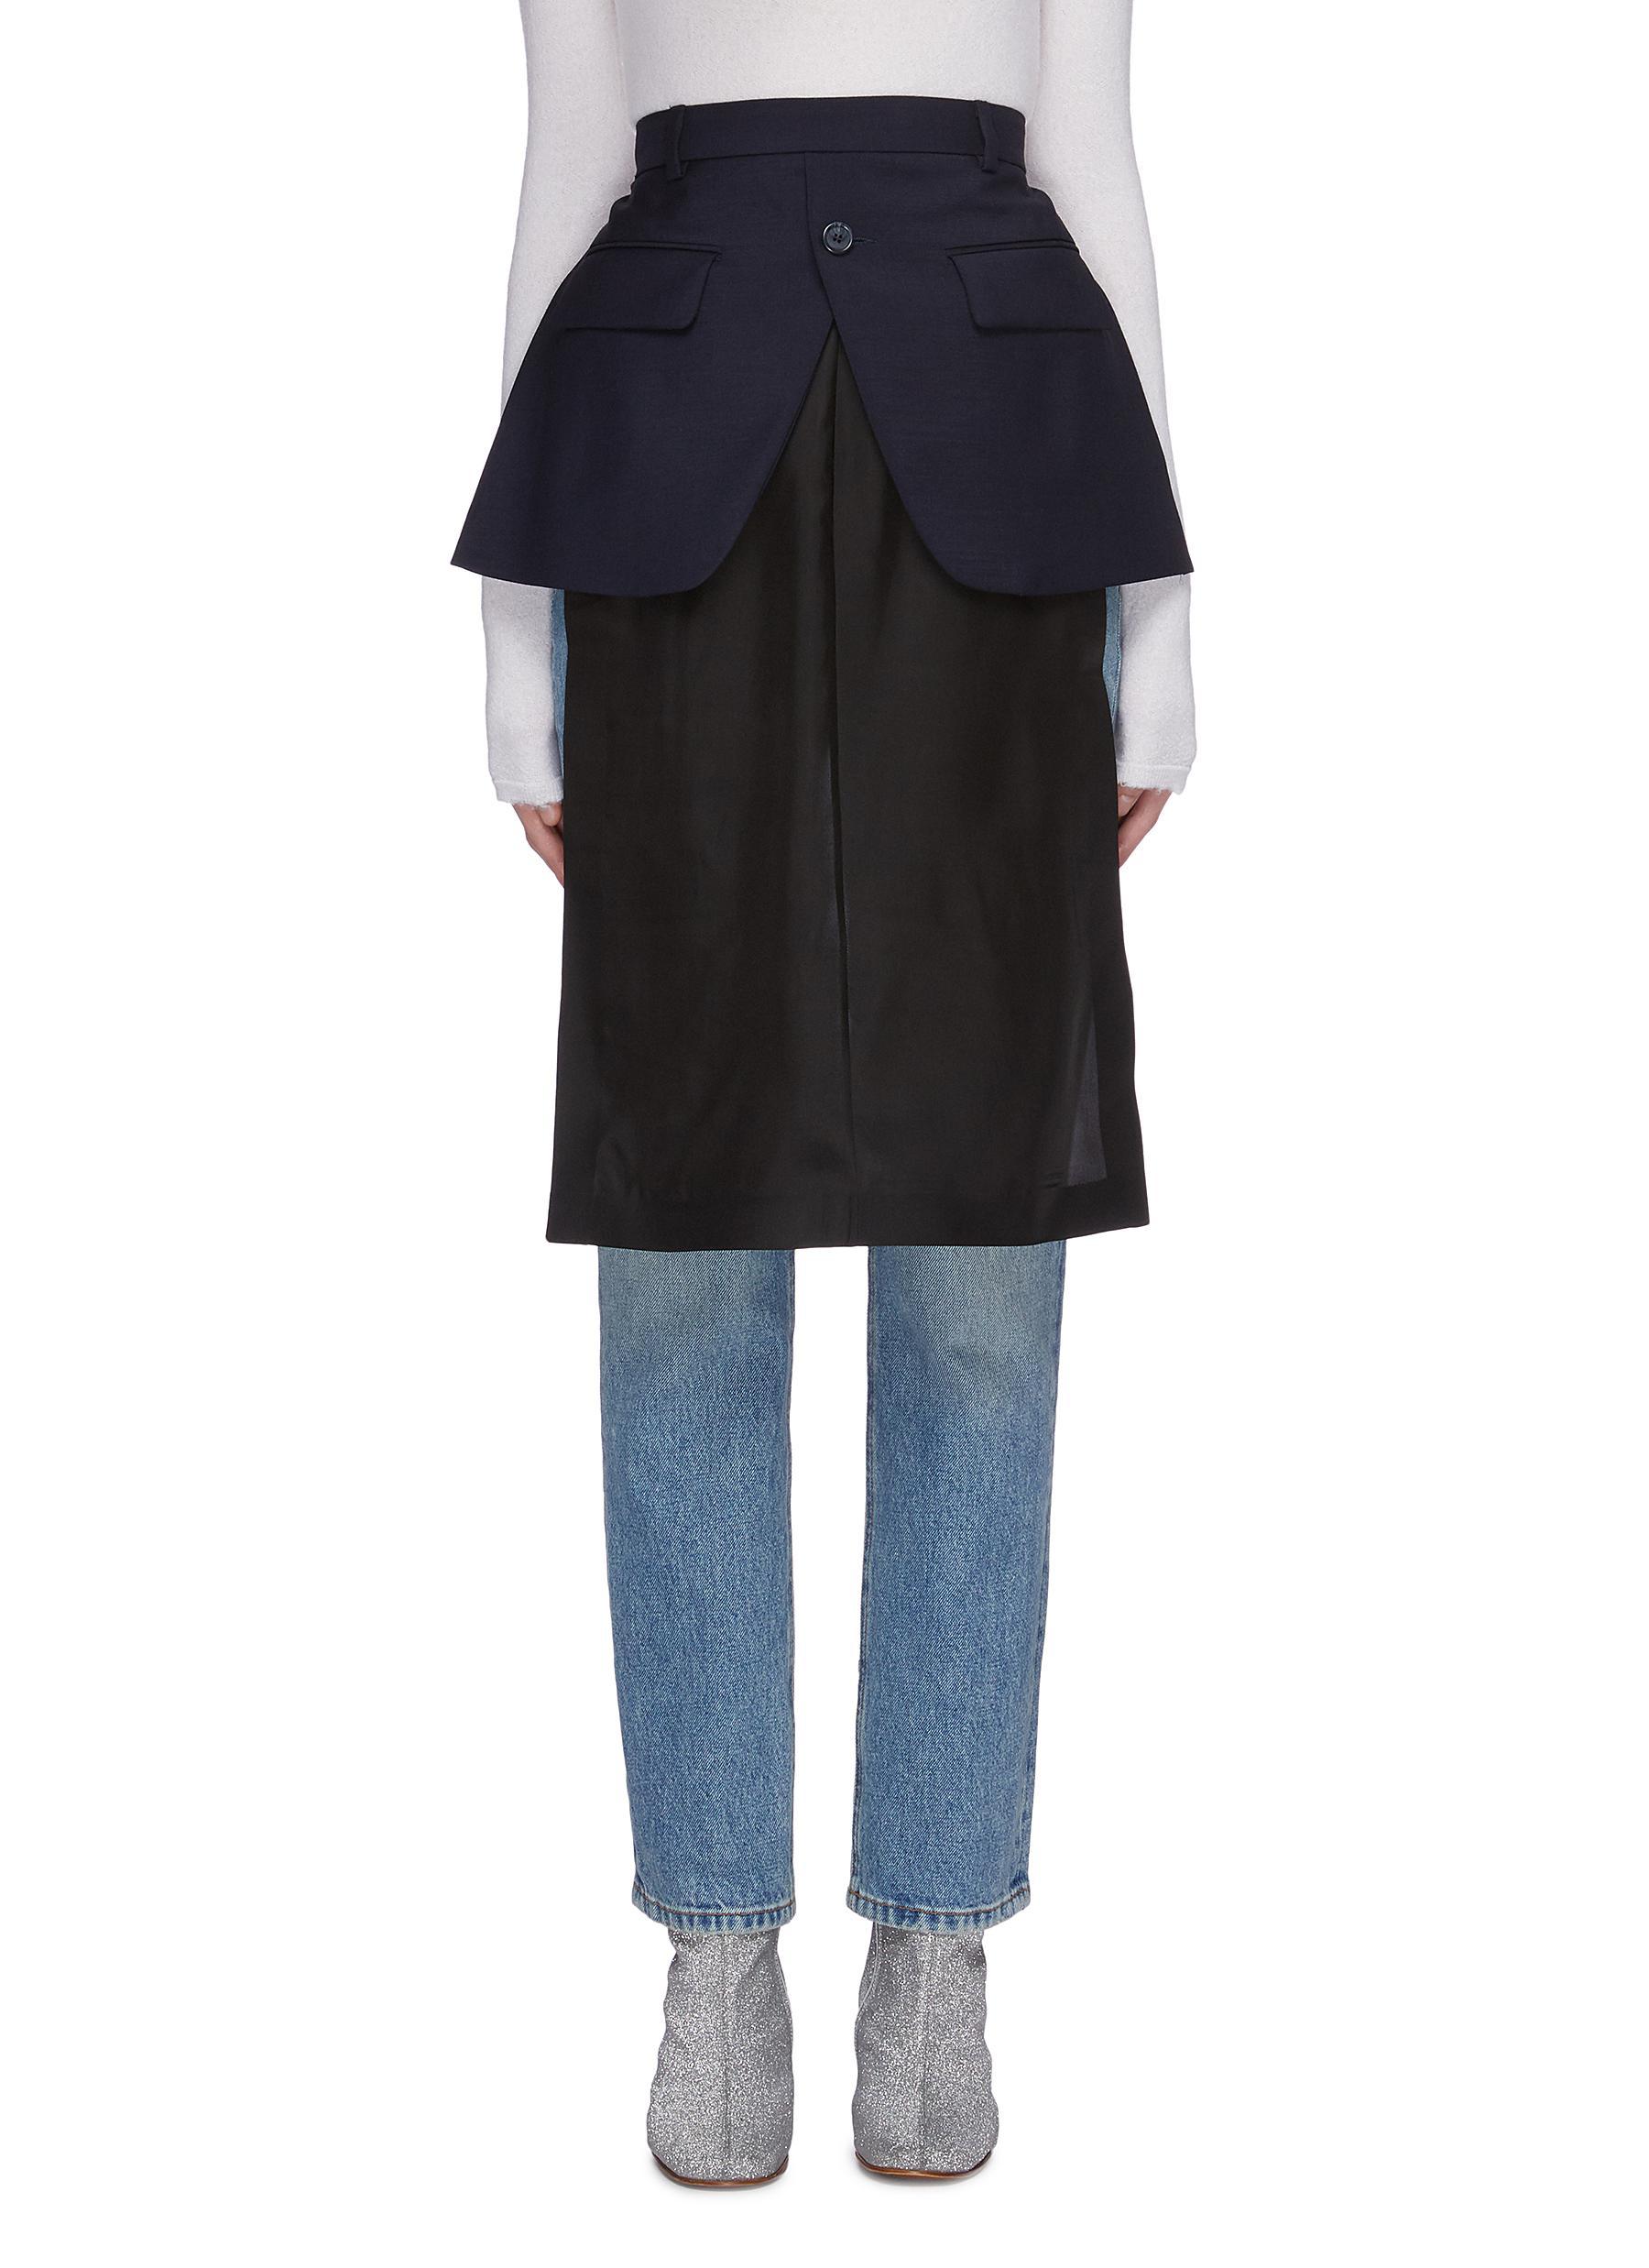 Blazer hem twill panel deconstructed skirt by Maison Margiela